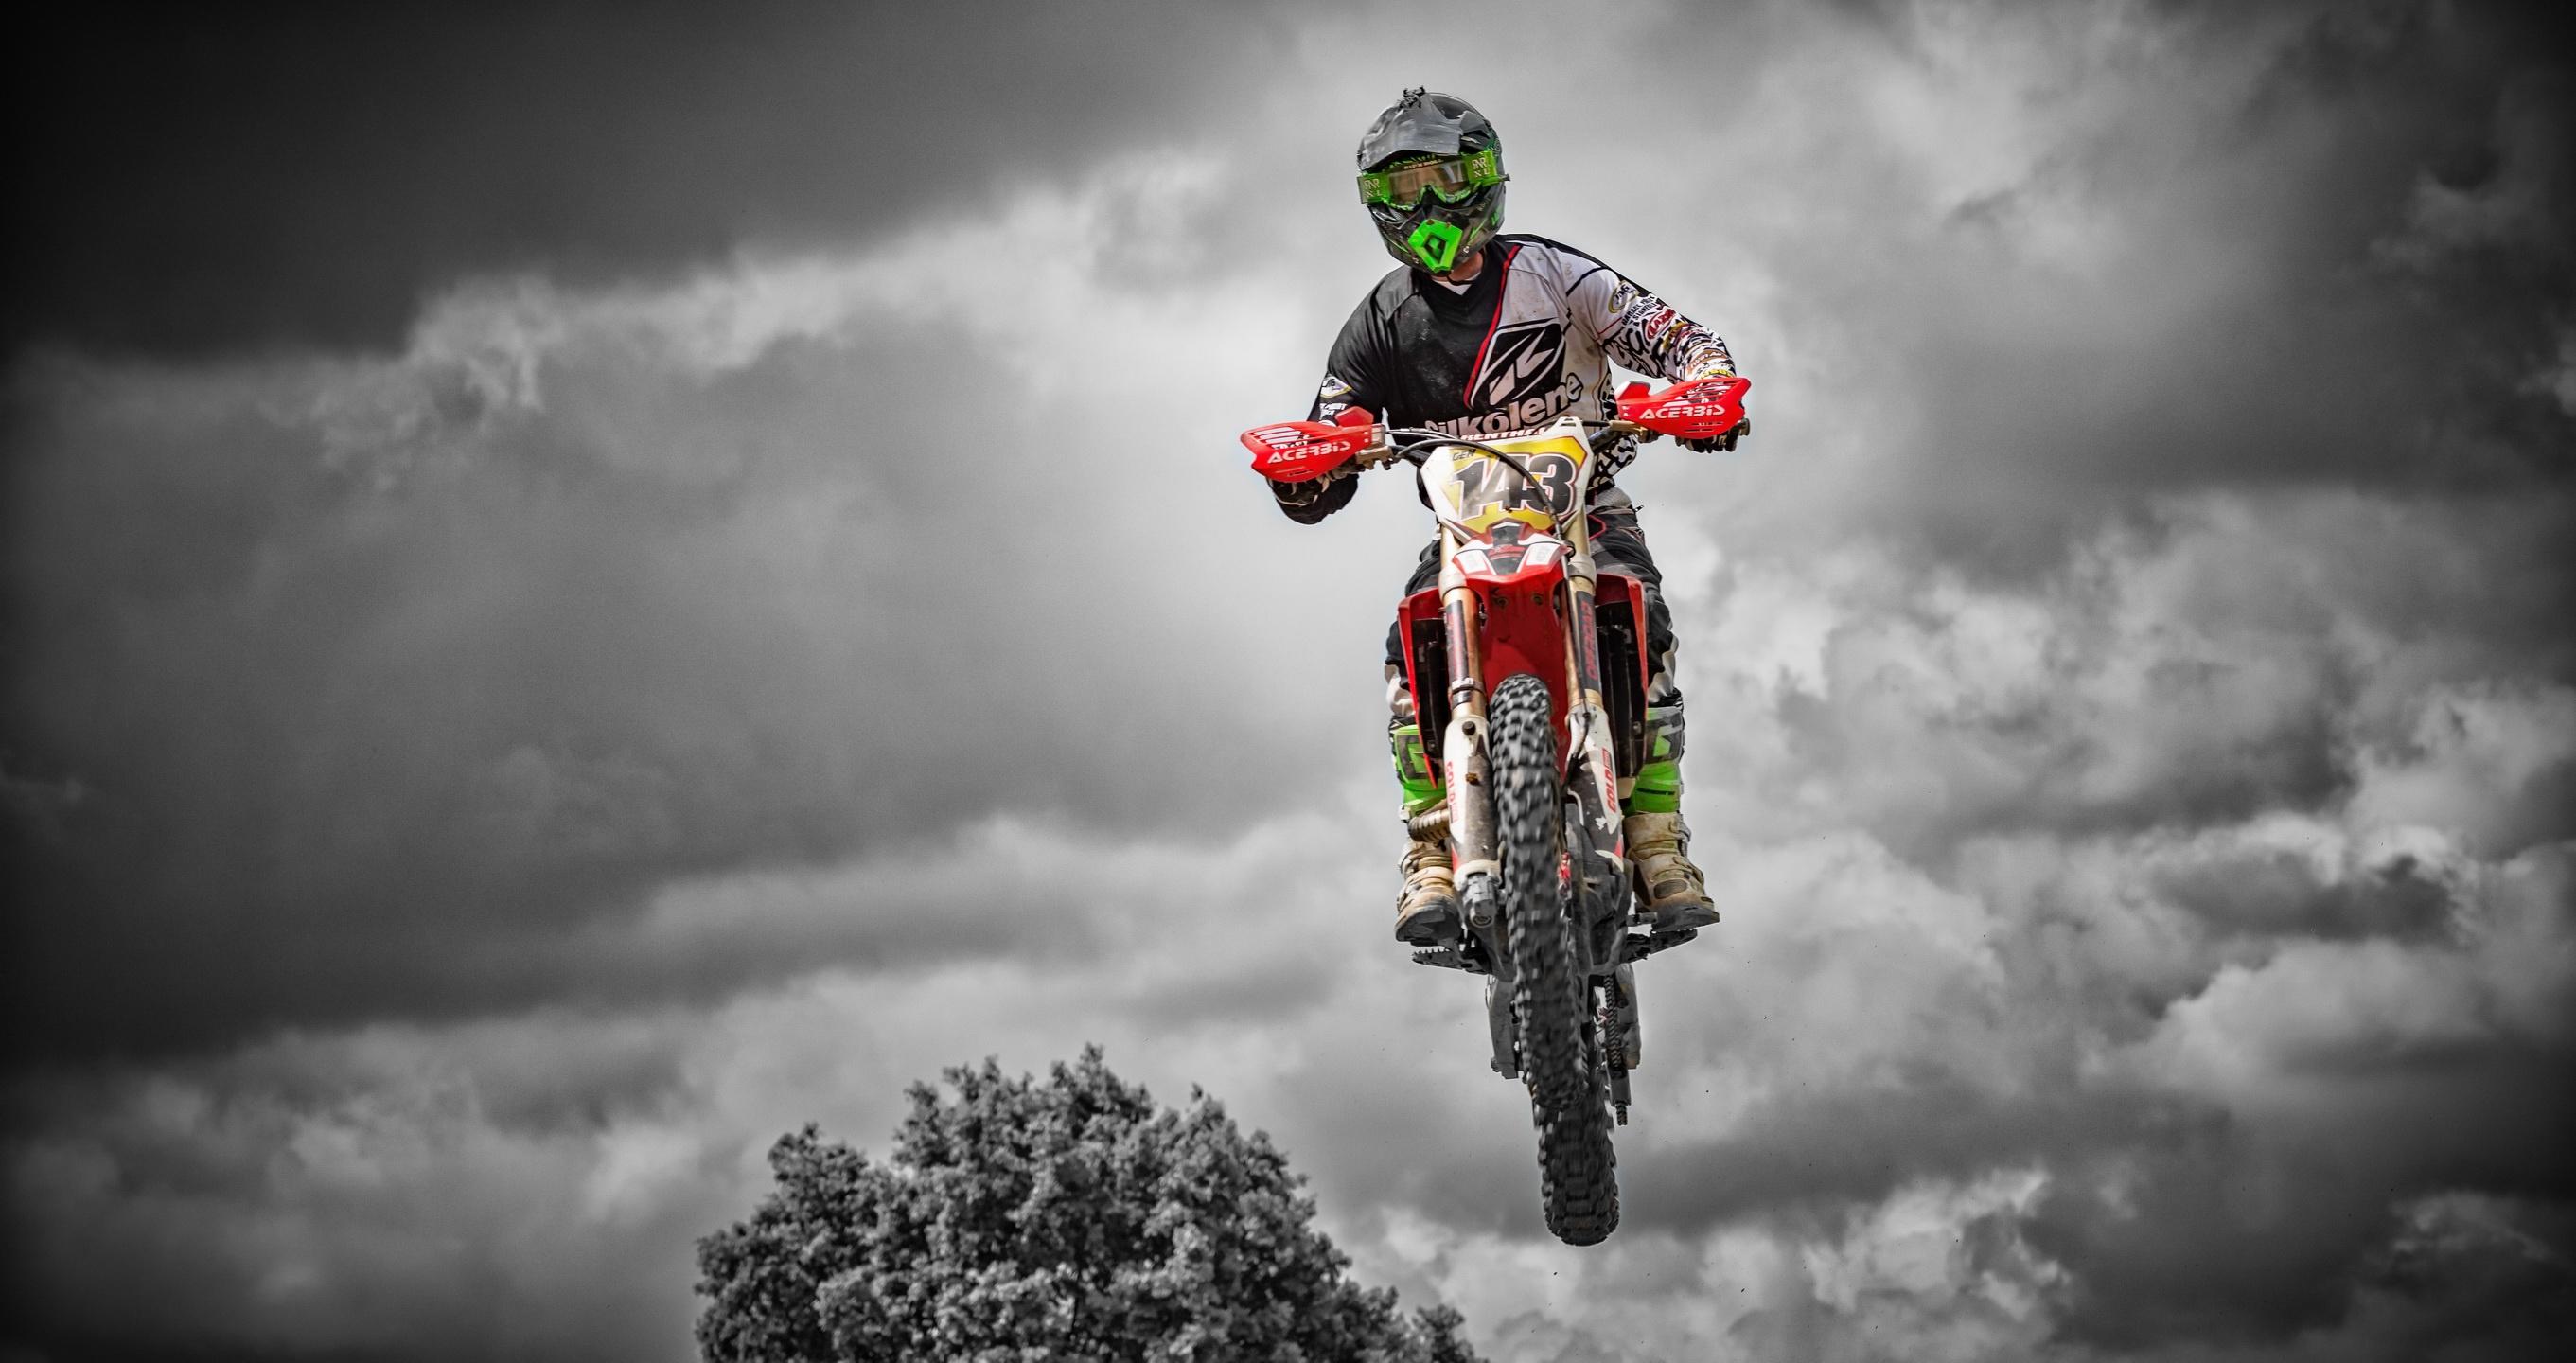 Motocross: Cloud, Motorcycle, Motocross